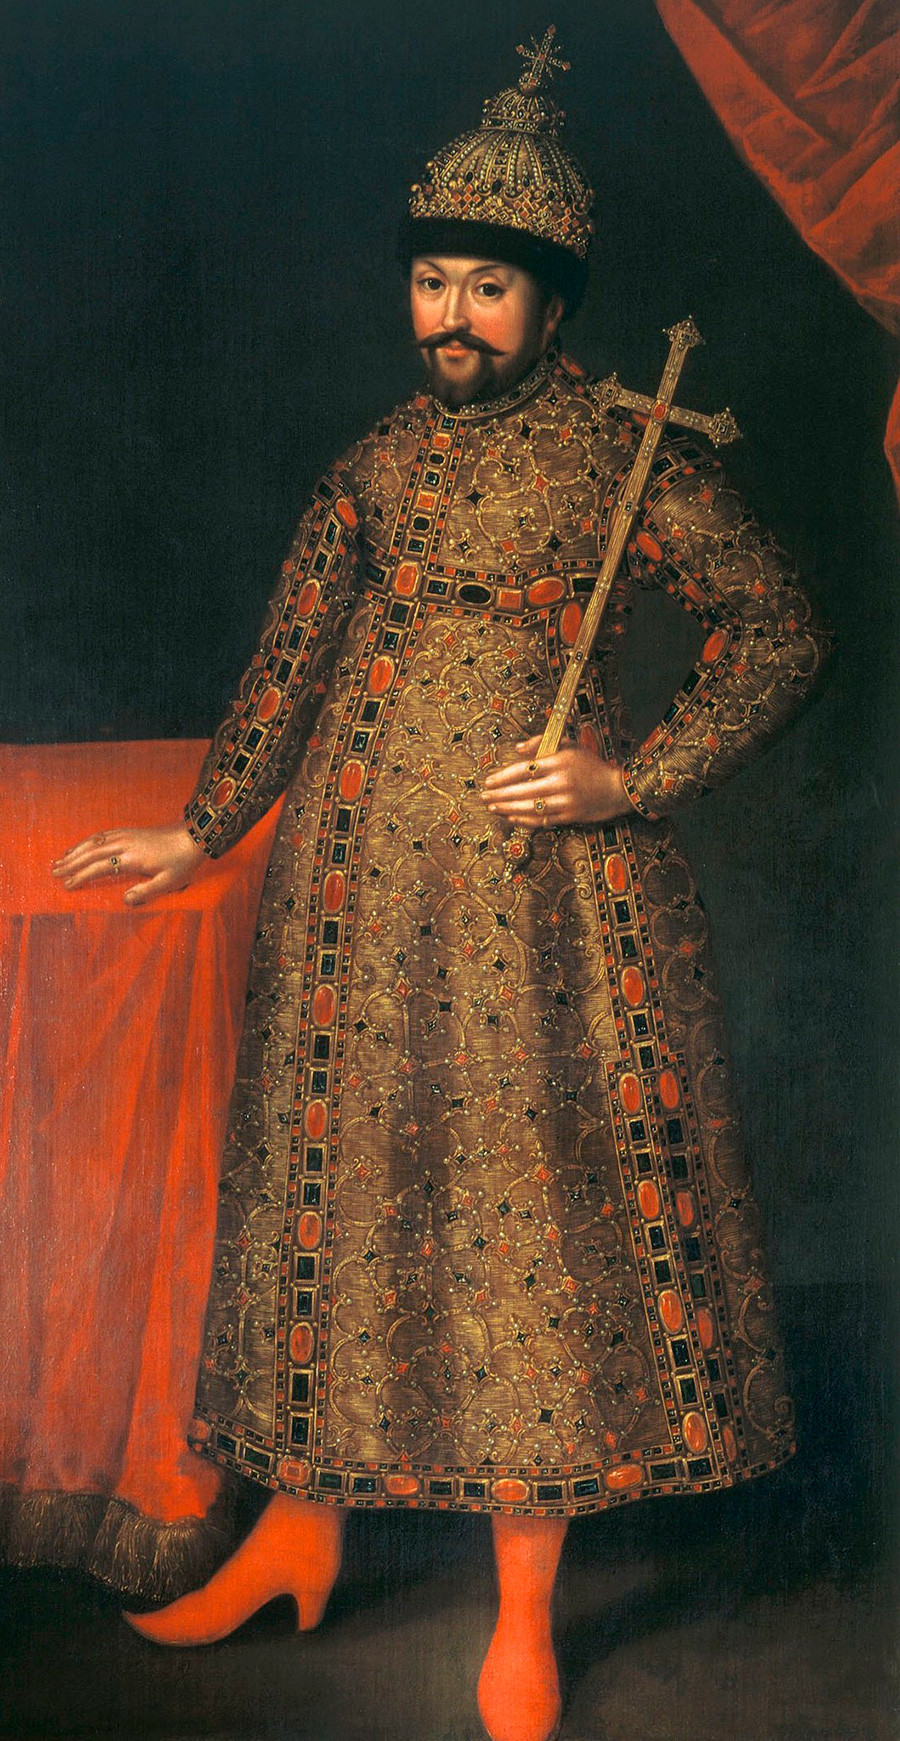 'Portrait of Tsar Mikhail Fyodorovich' by Johann Heinrich Wedekind (1674-1736)